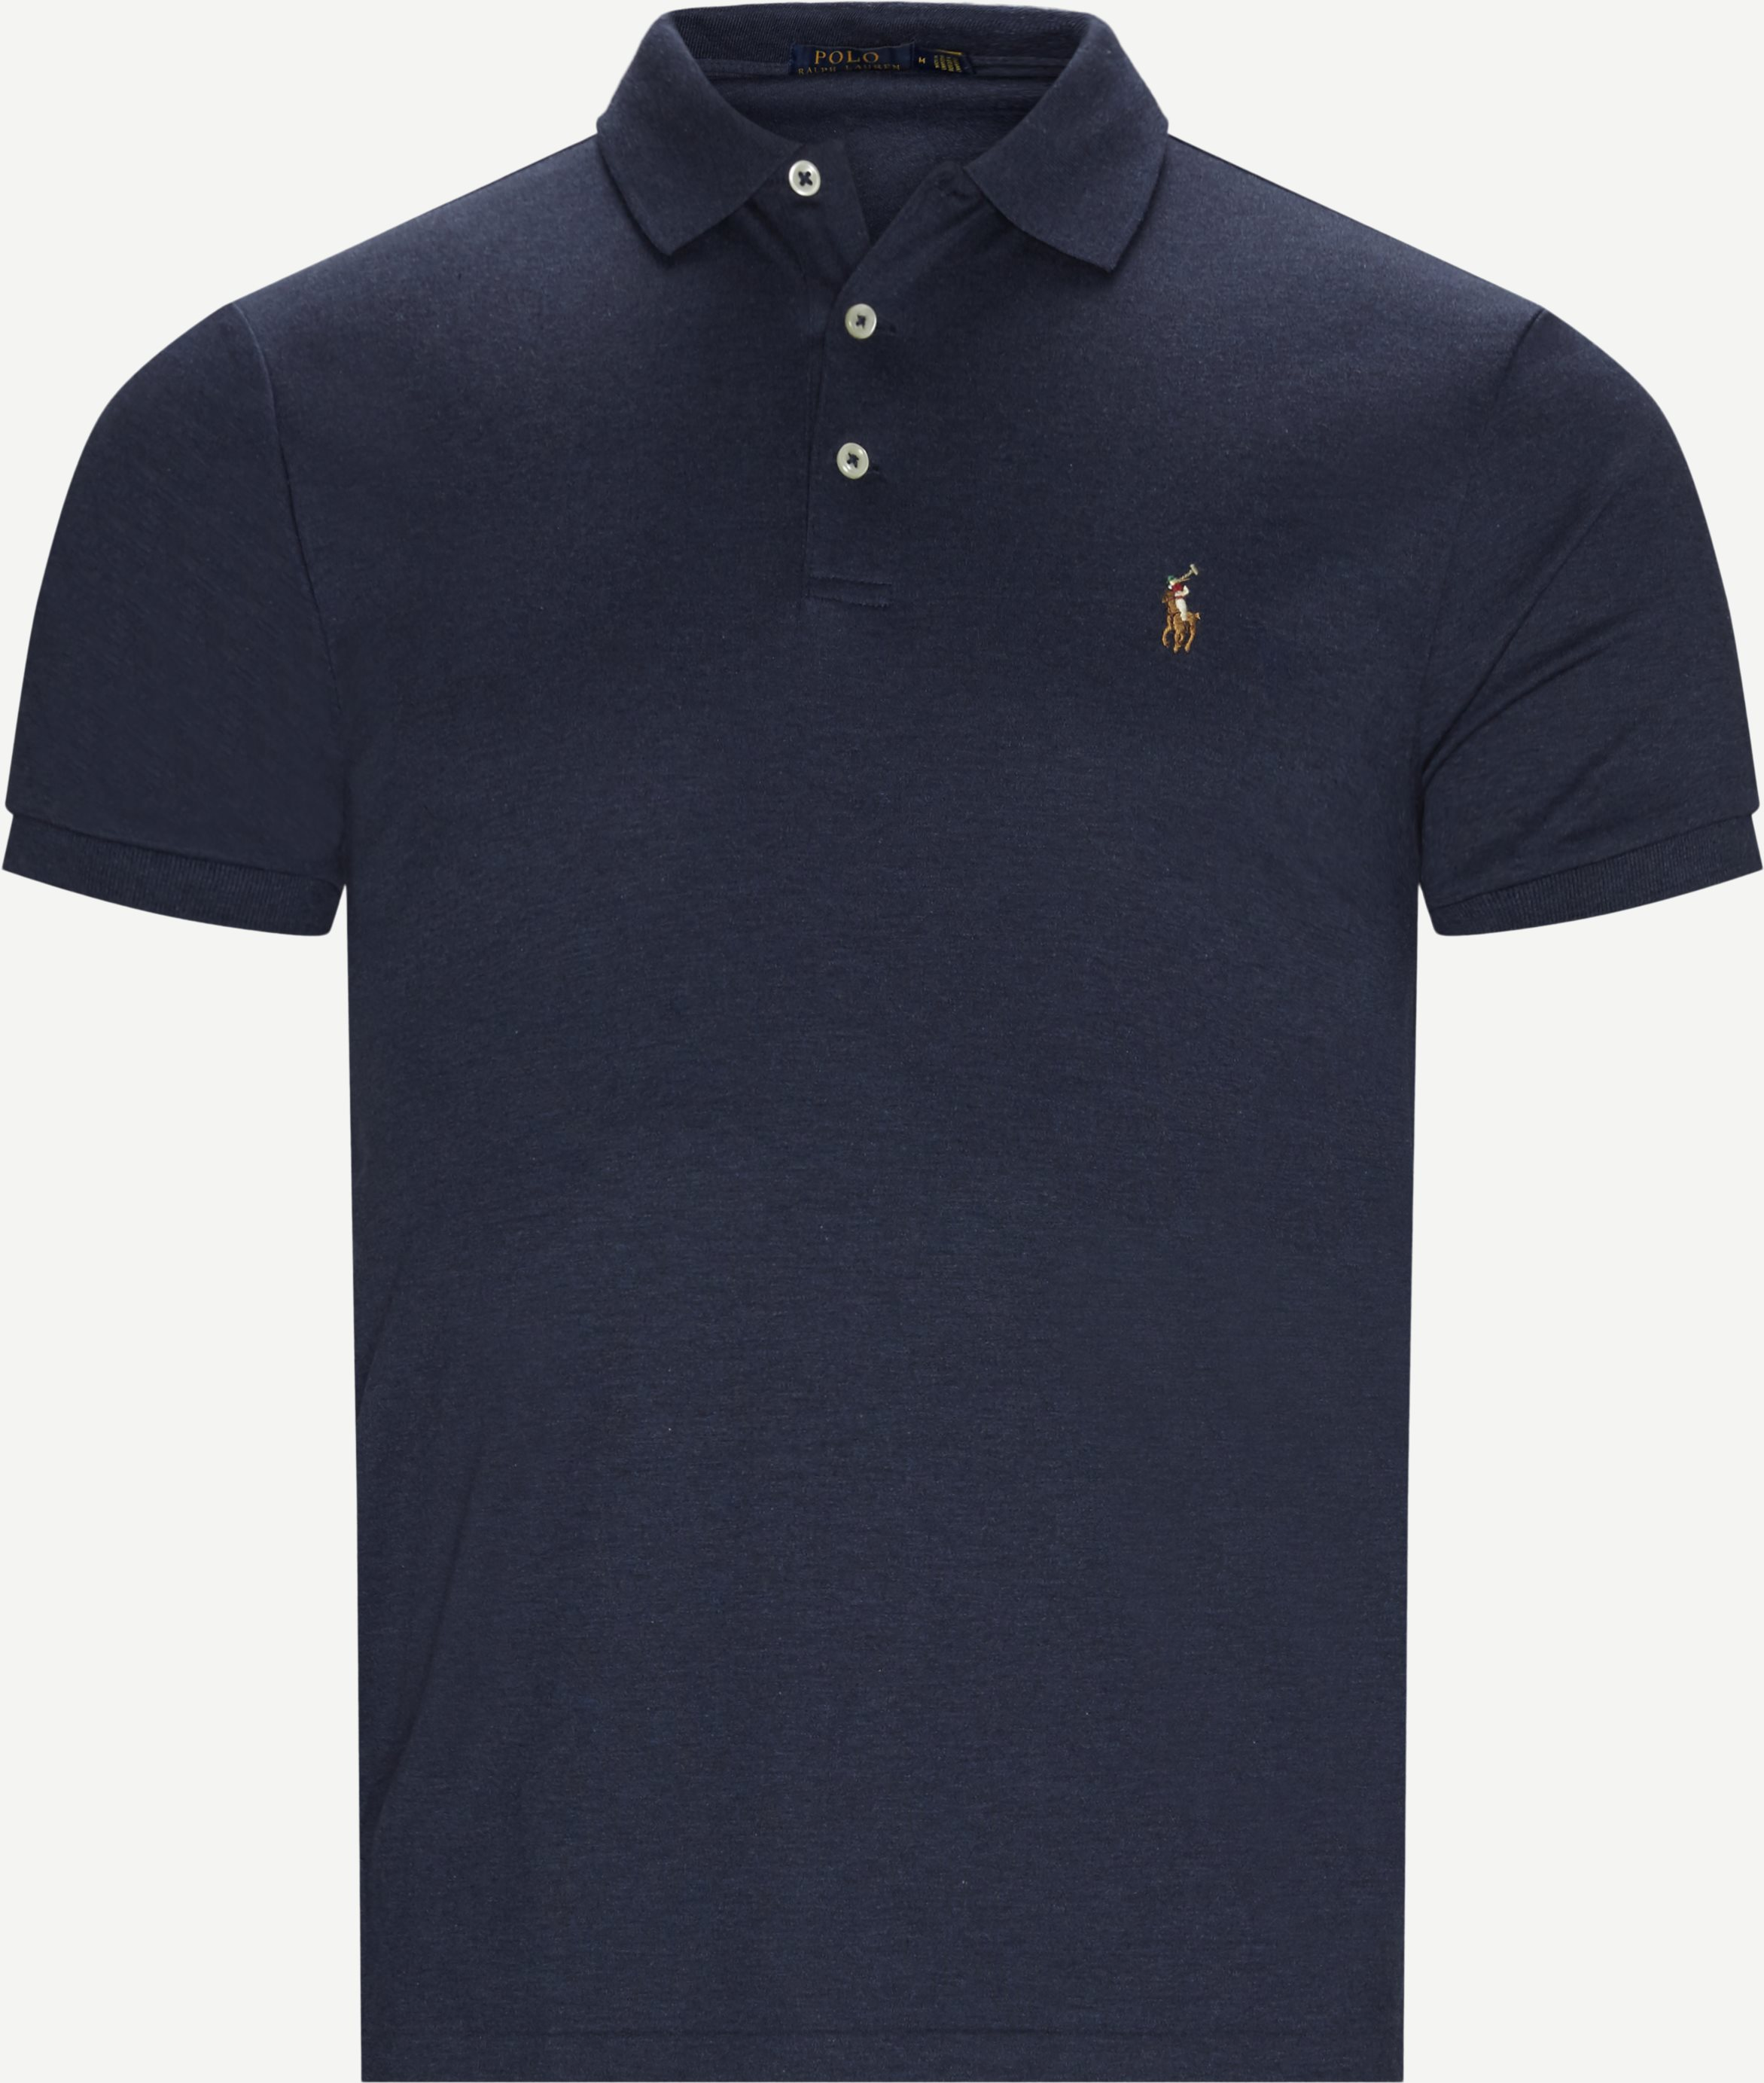 T-Shirts - Regular slim fit - Blau